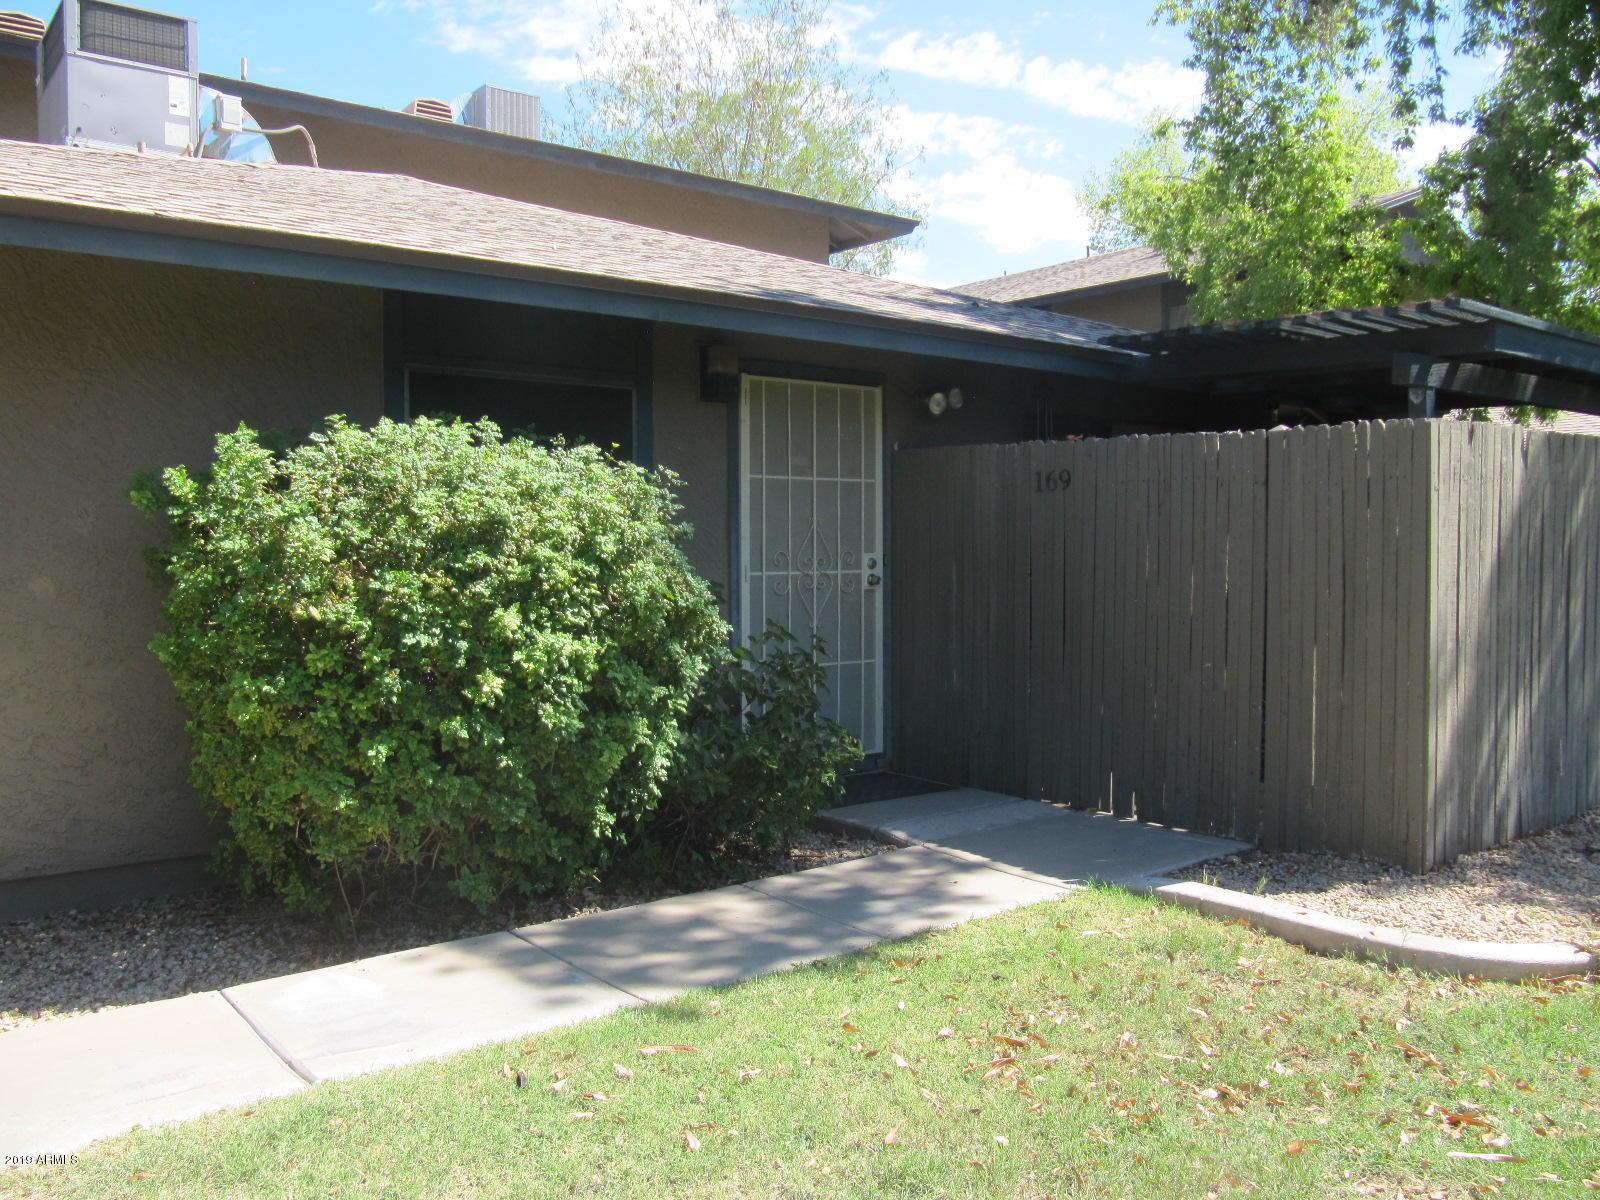 Photo of 286 W Palomino Drive #169, Chandler, AZ 85225